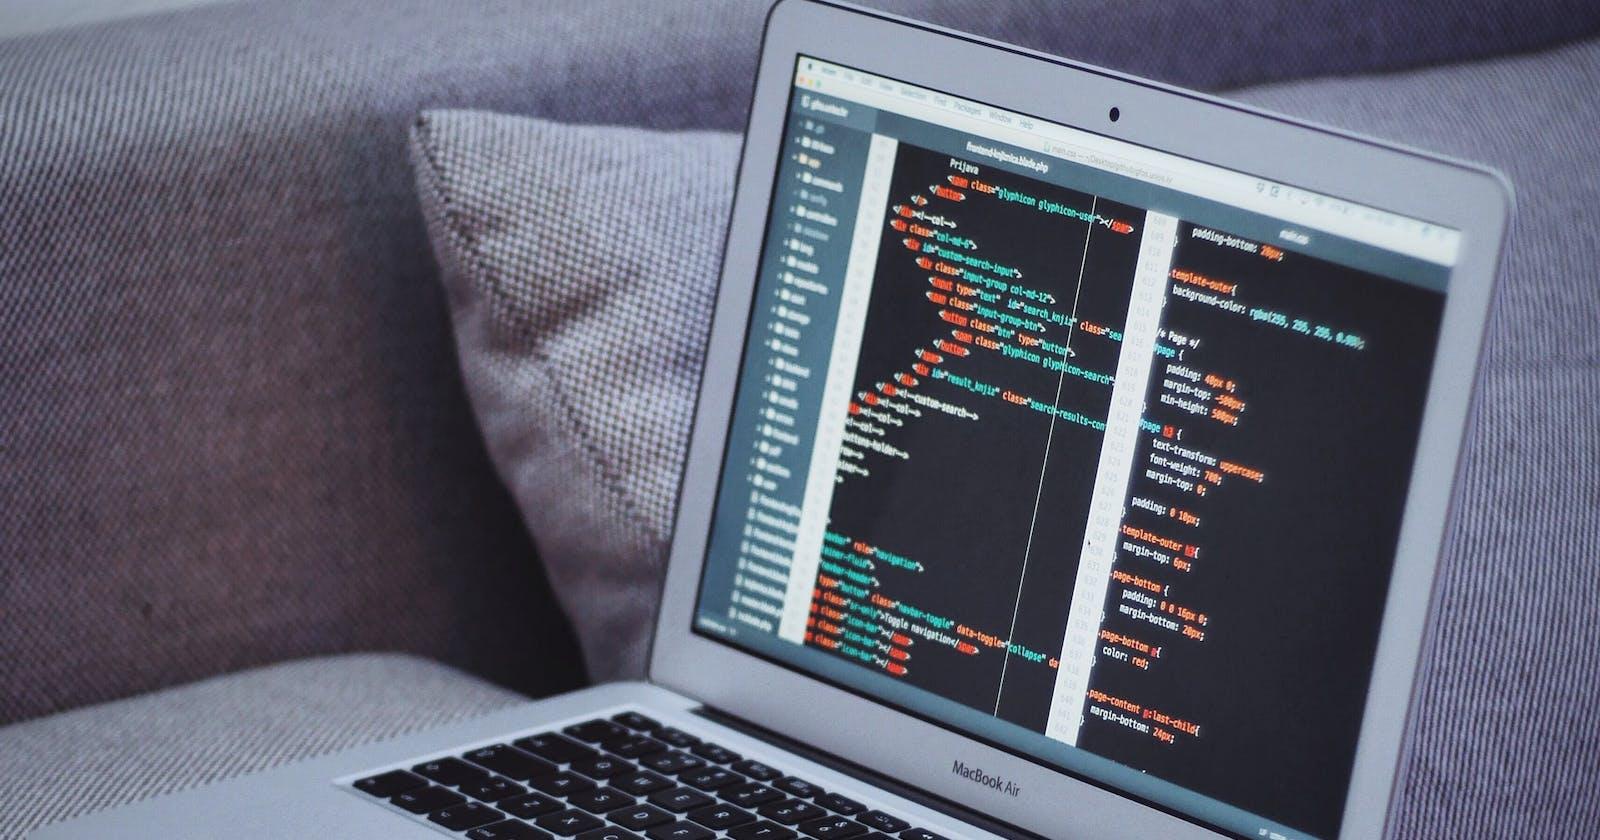 7 Websites Every Developer Should Know